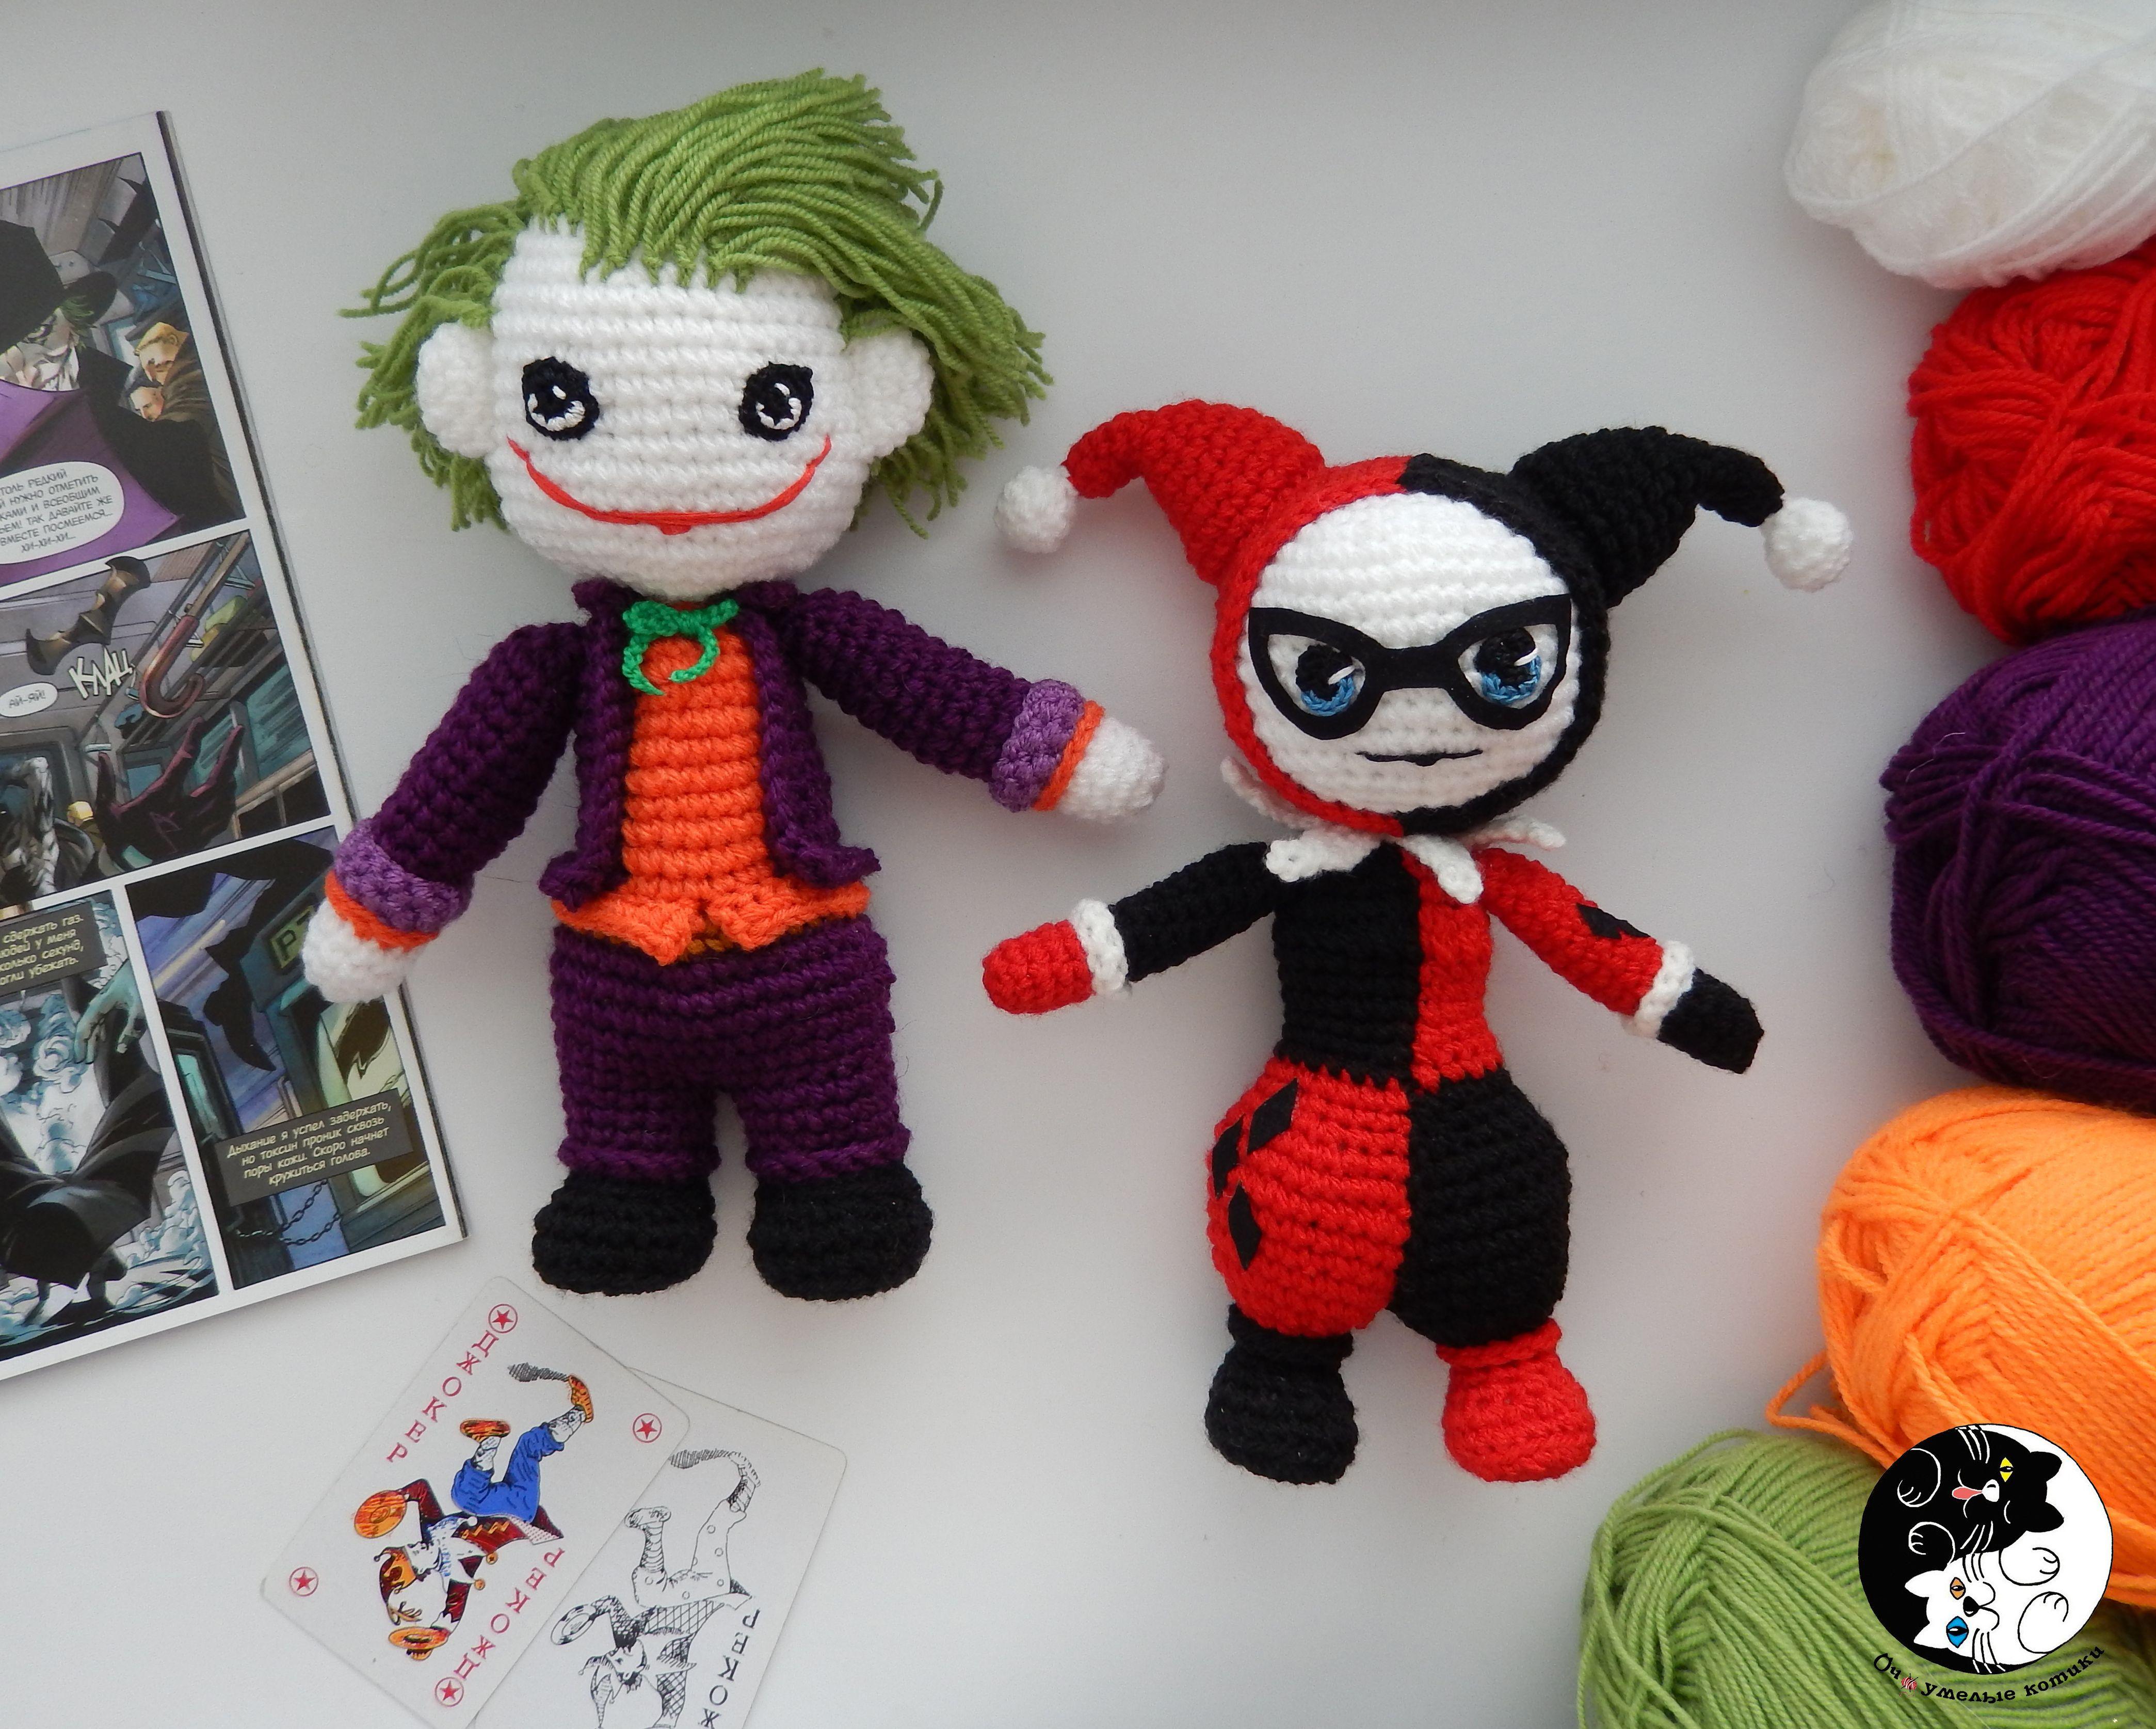 Harley Quinn Amigurumi - Knitted Joker - Crochet Doll - DC Comics ...